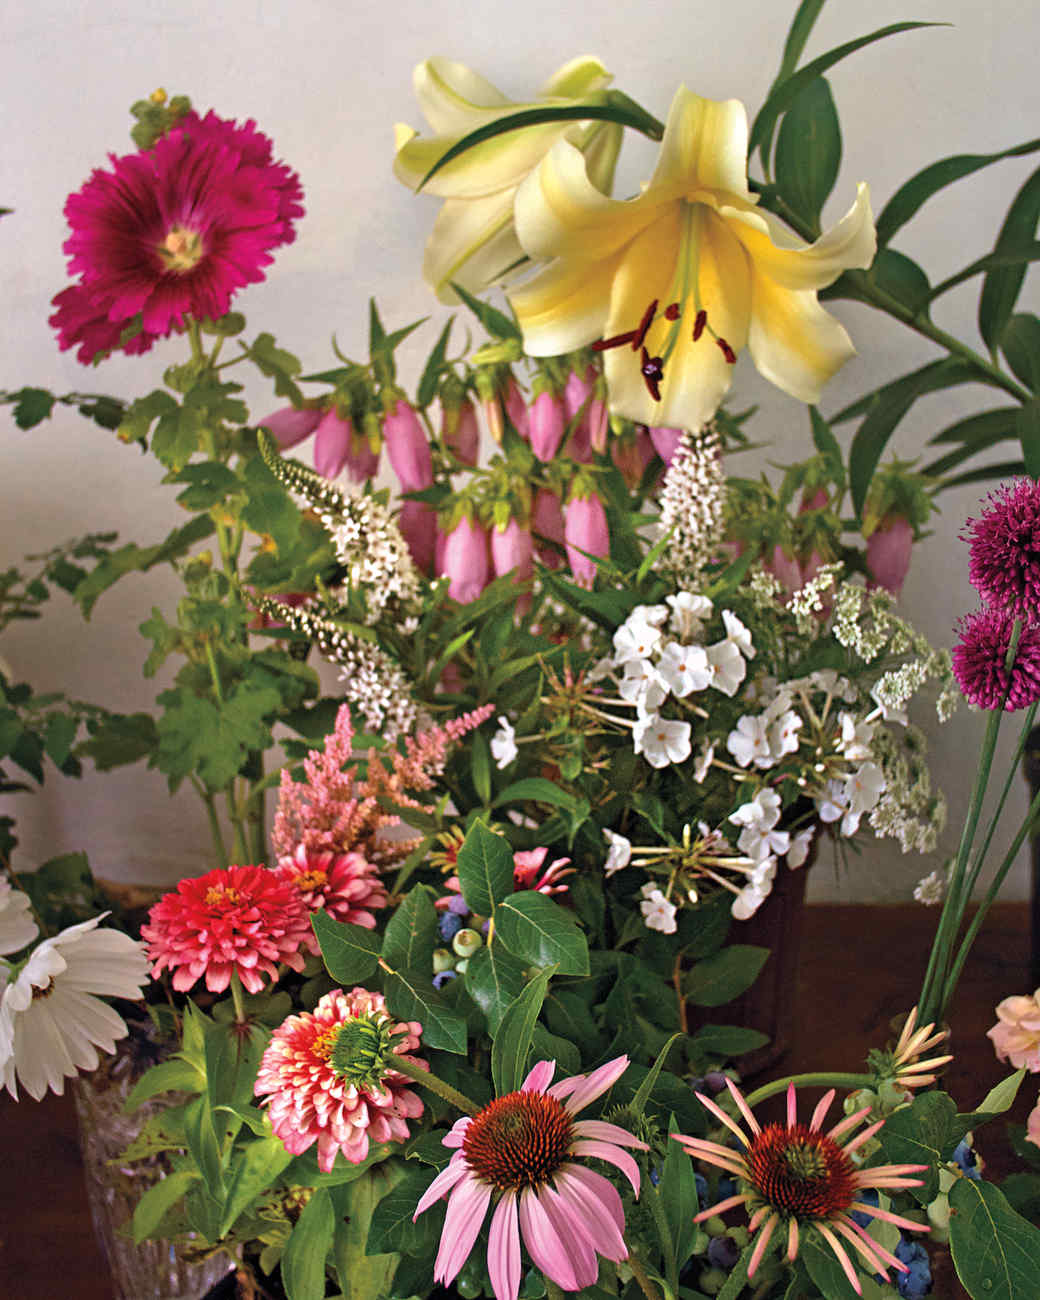 flowers-reportage-bw-006-d110446.jpg